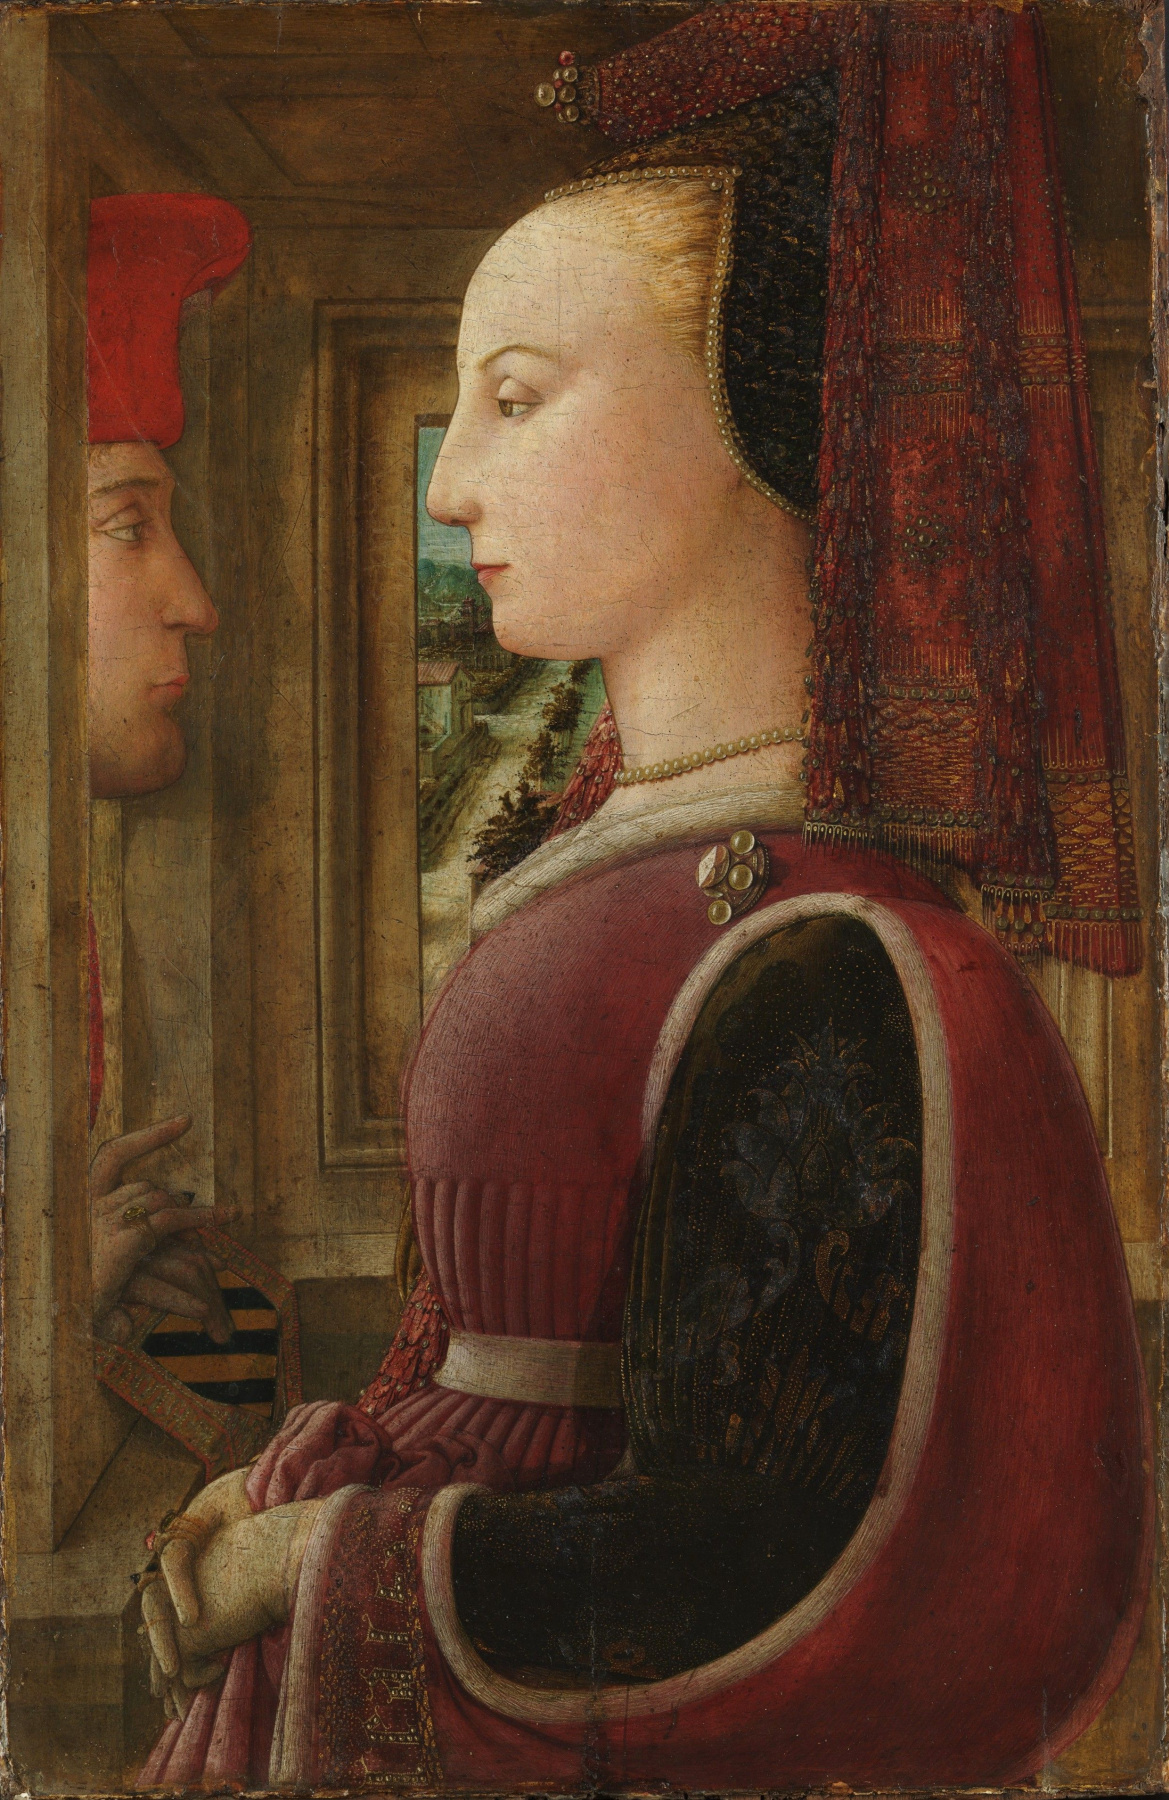 Fra Filippo Lippi. Double portrait (portrait of the men and women at the window)